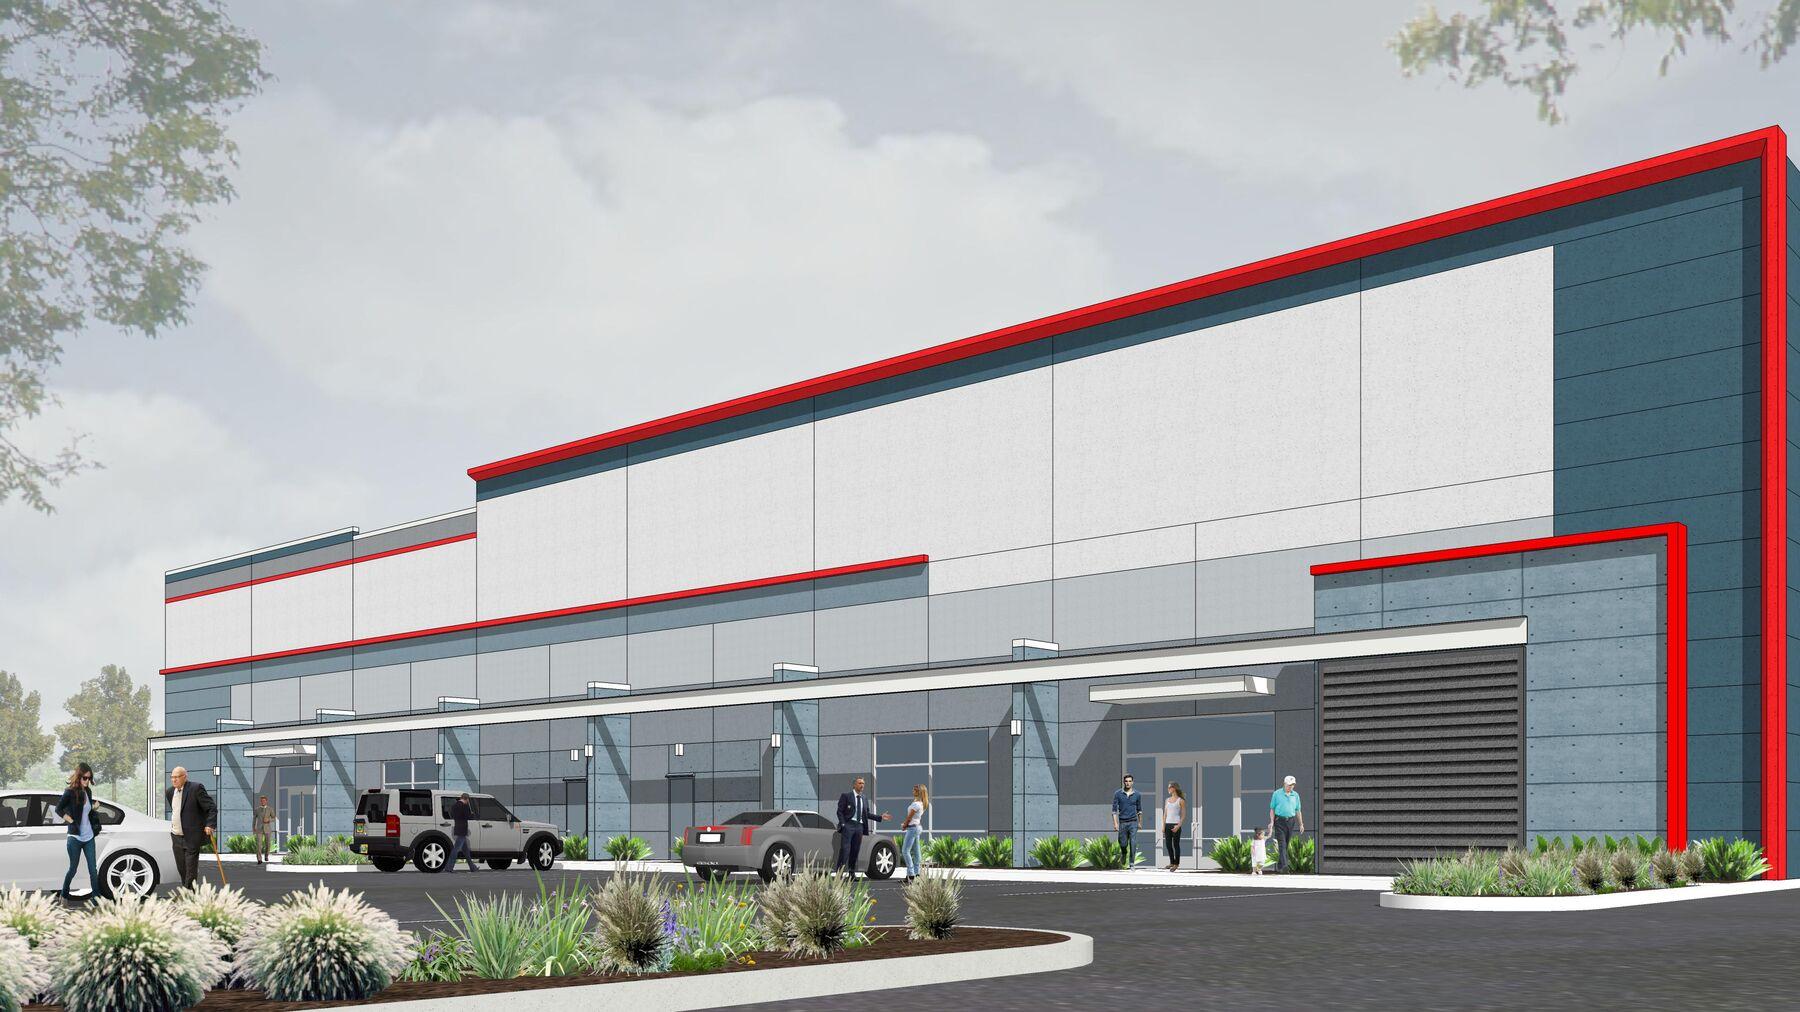 DPM-1420-Old-Bayshore-Hwy-North-San-Jose-46-g-iig158-Warehouse-Rendering-2.jpg